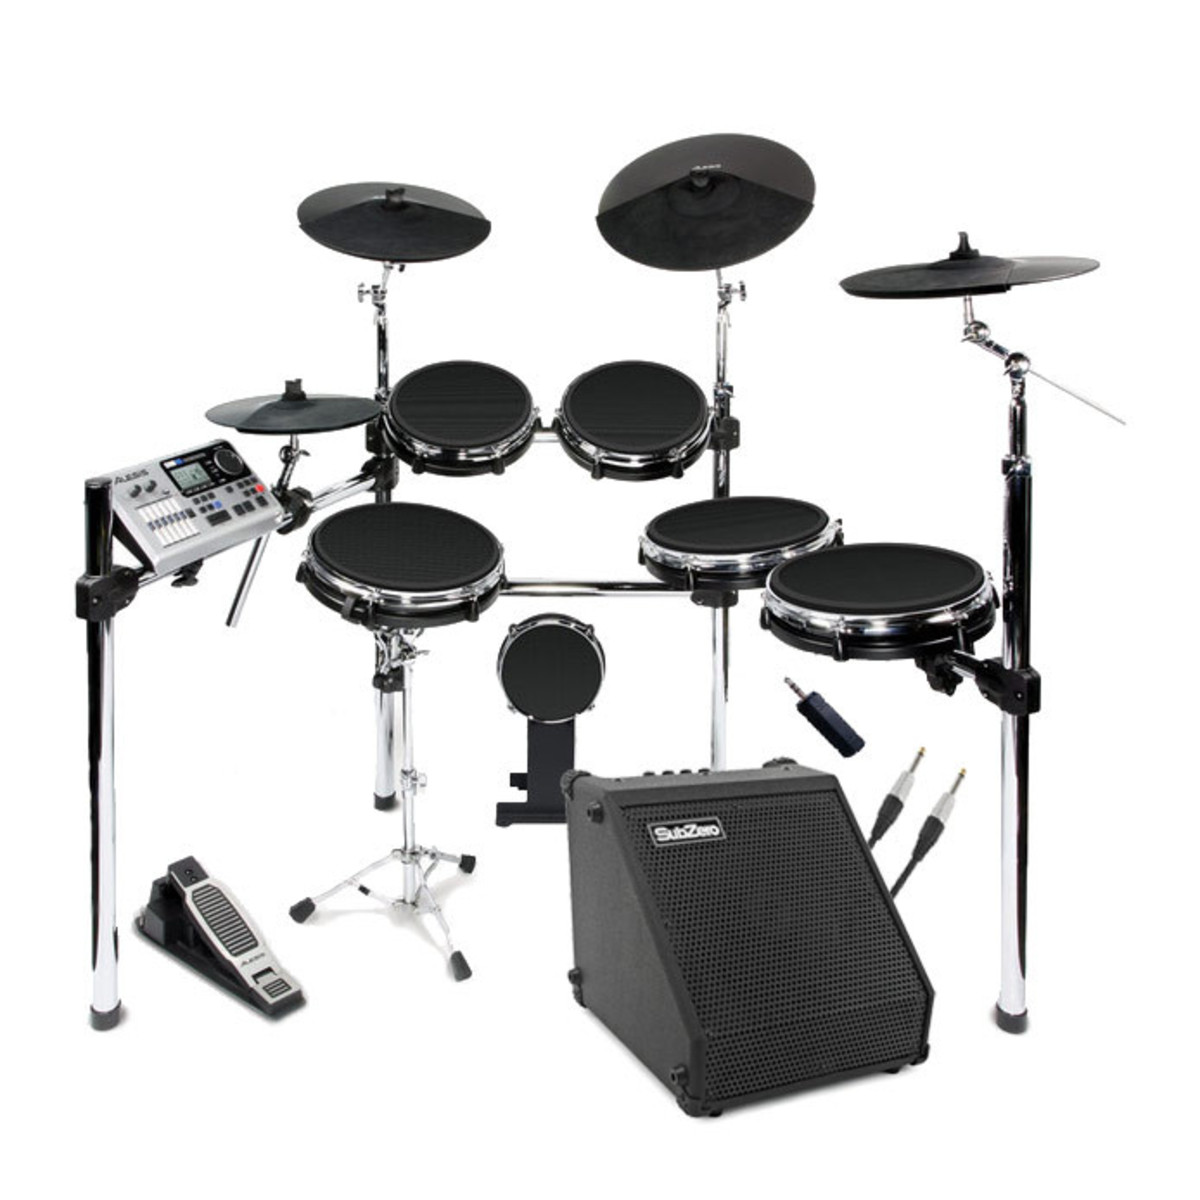 disc alesis dm10 studio kit mesh digital drum kit bundle at gear4music